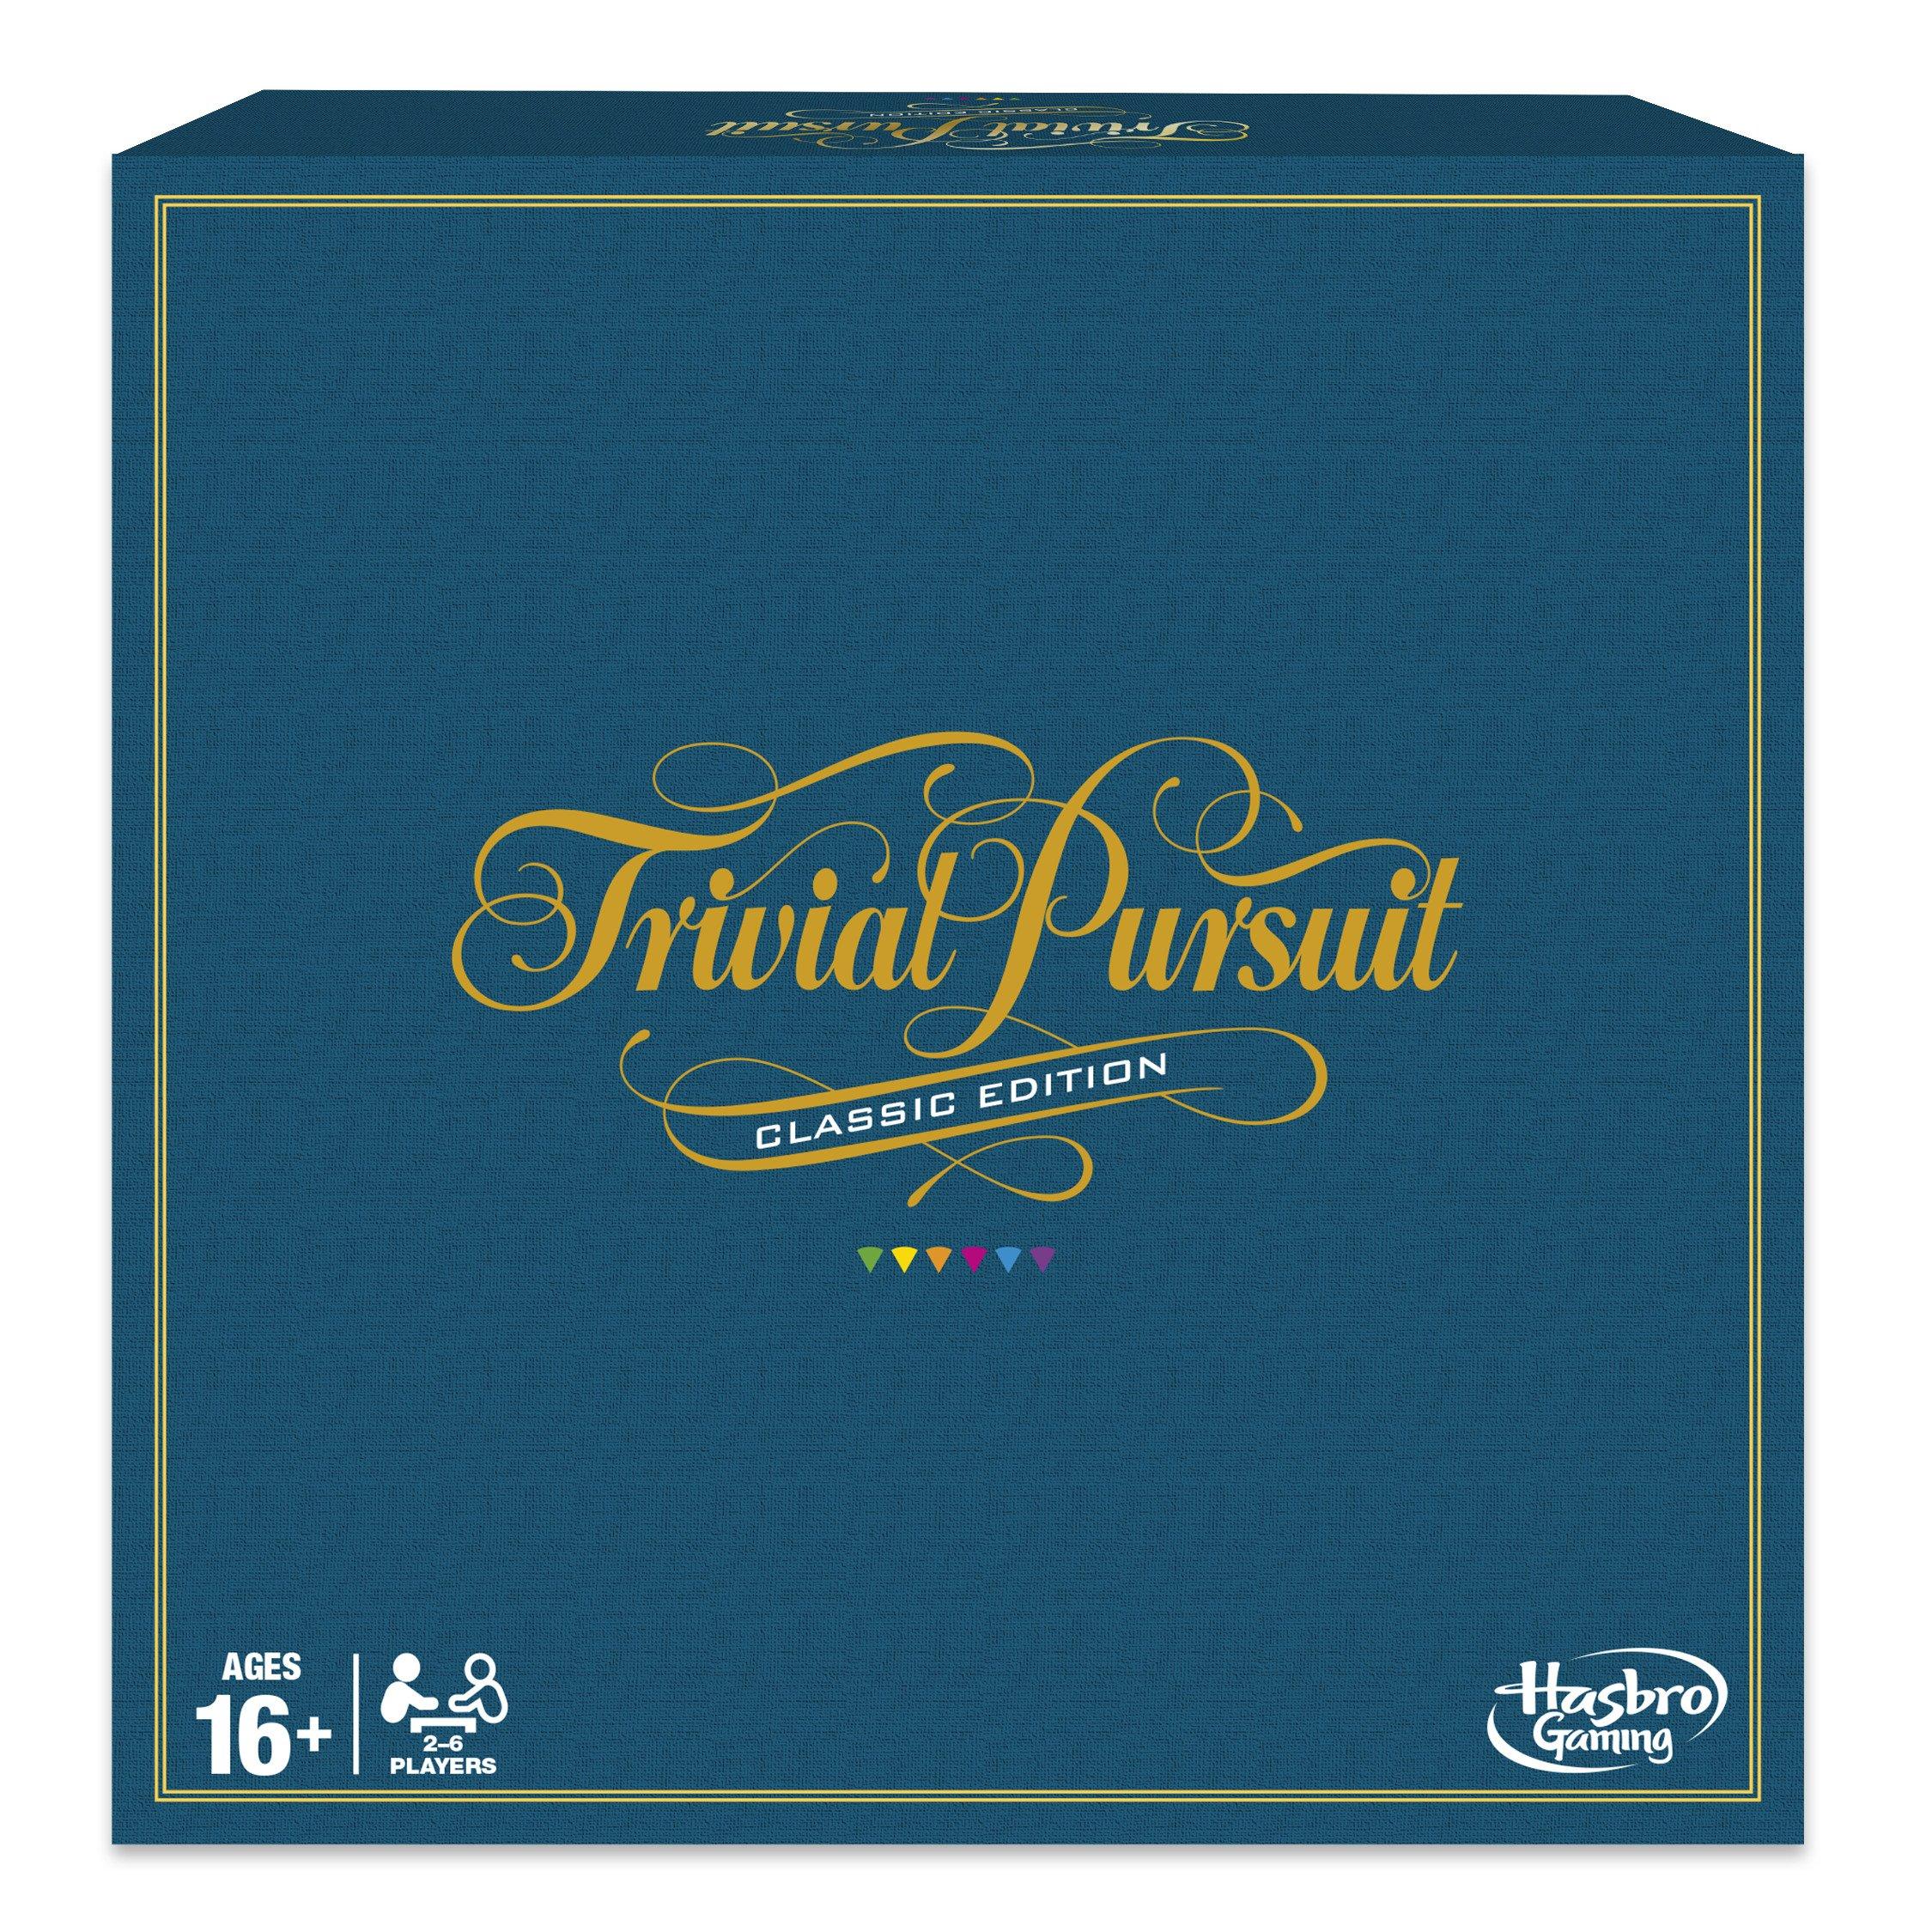 Hasbro Trivial Pursuit Game: Classic Edition